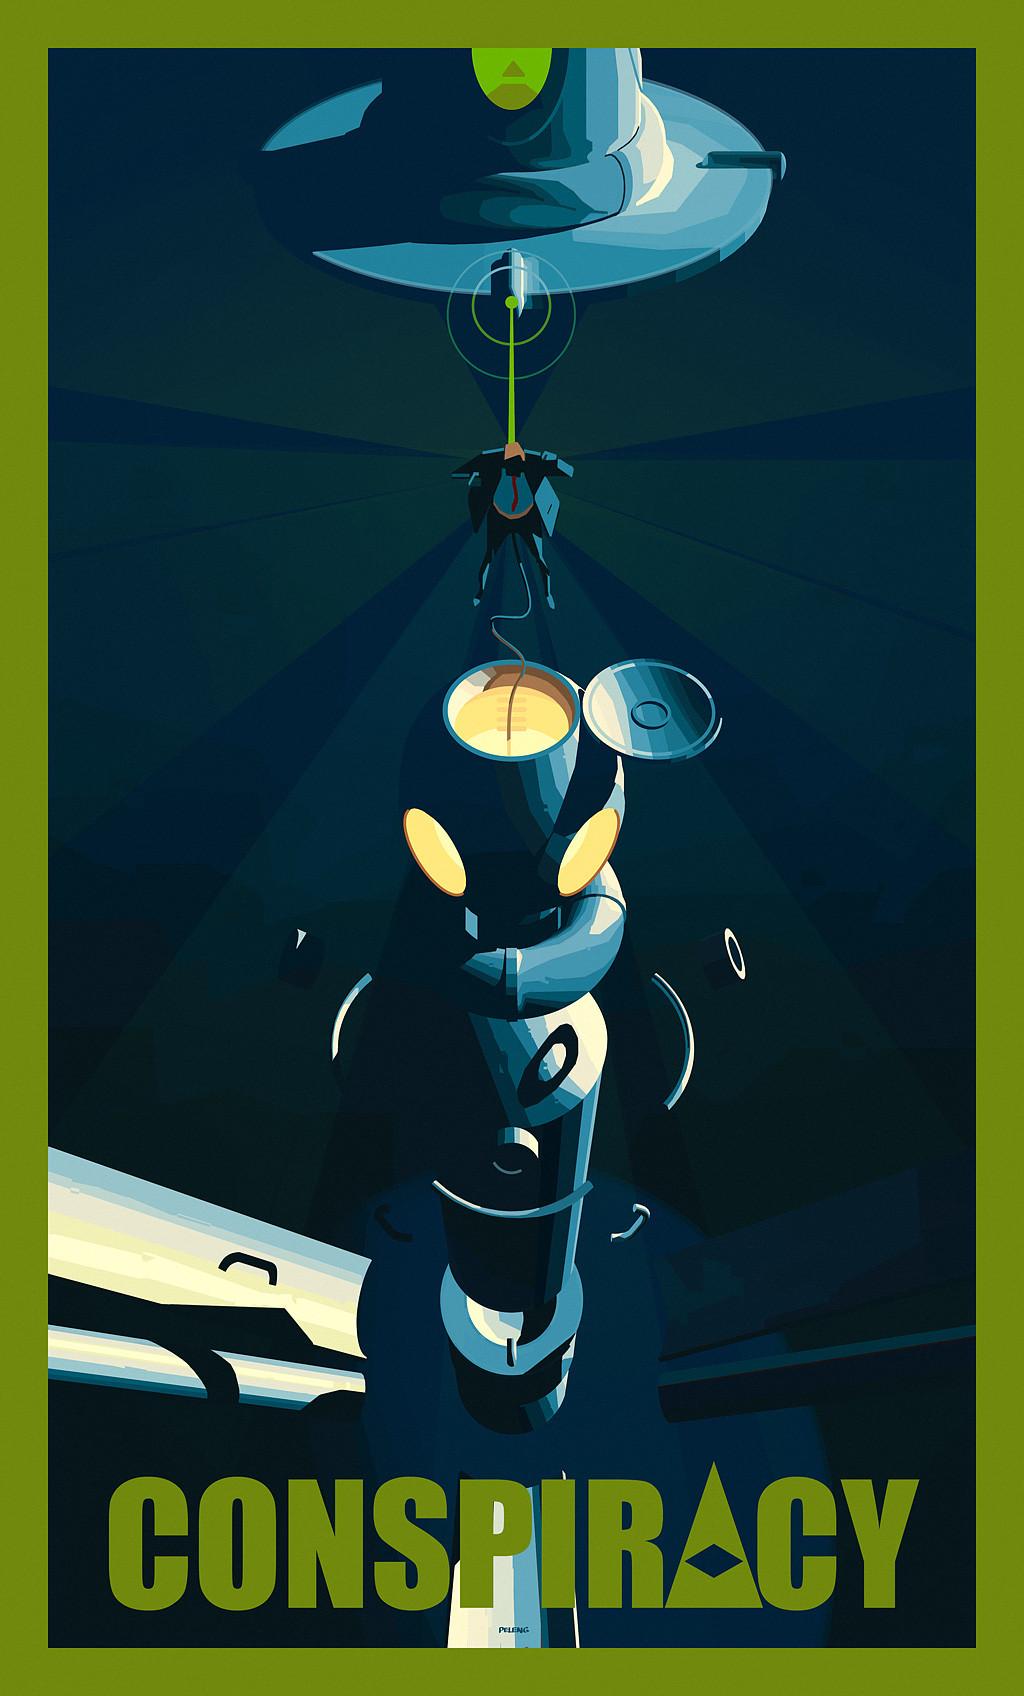 Sergey kolesov conspiracy poster